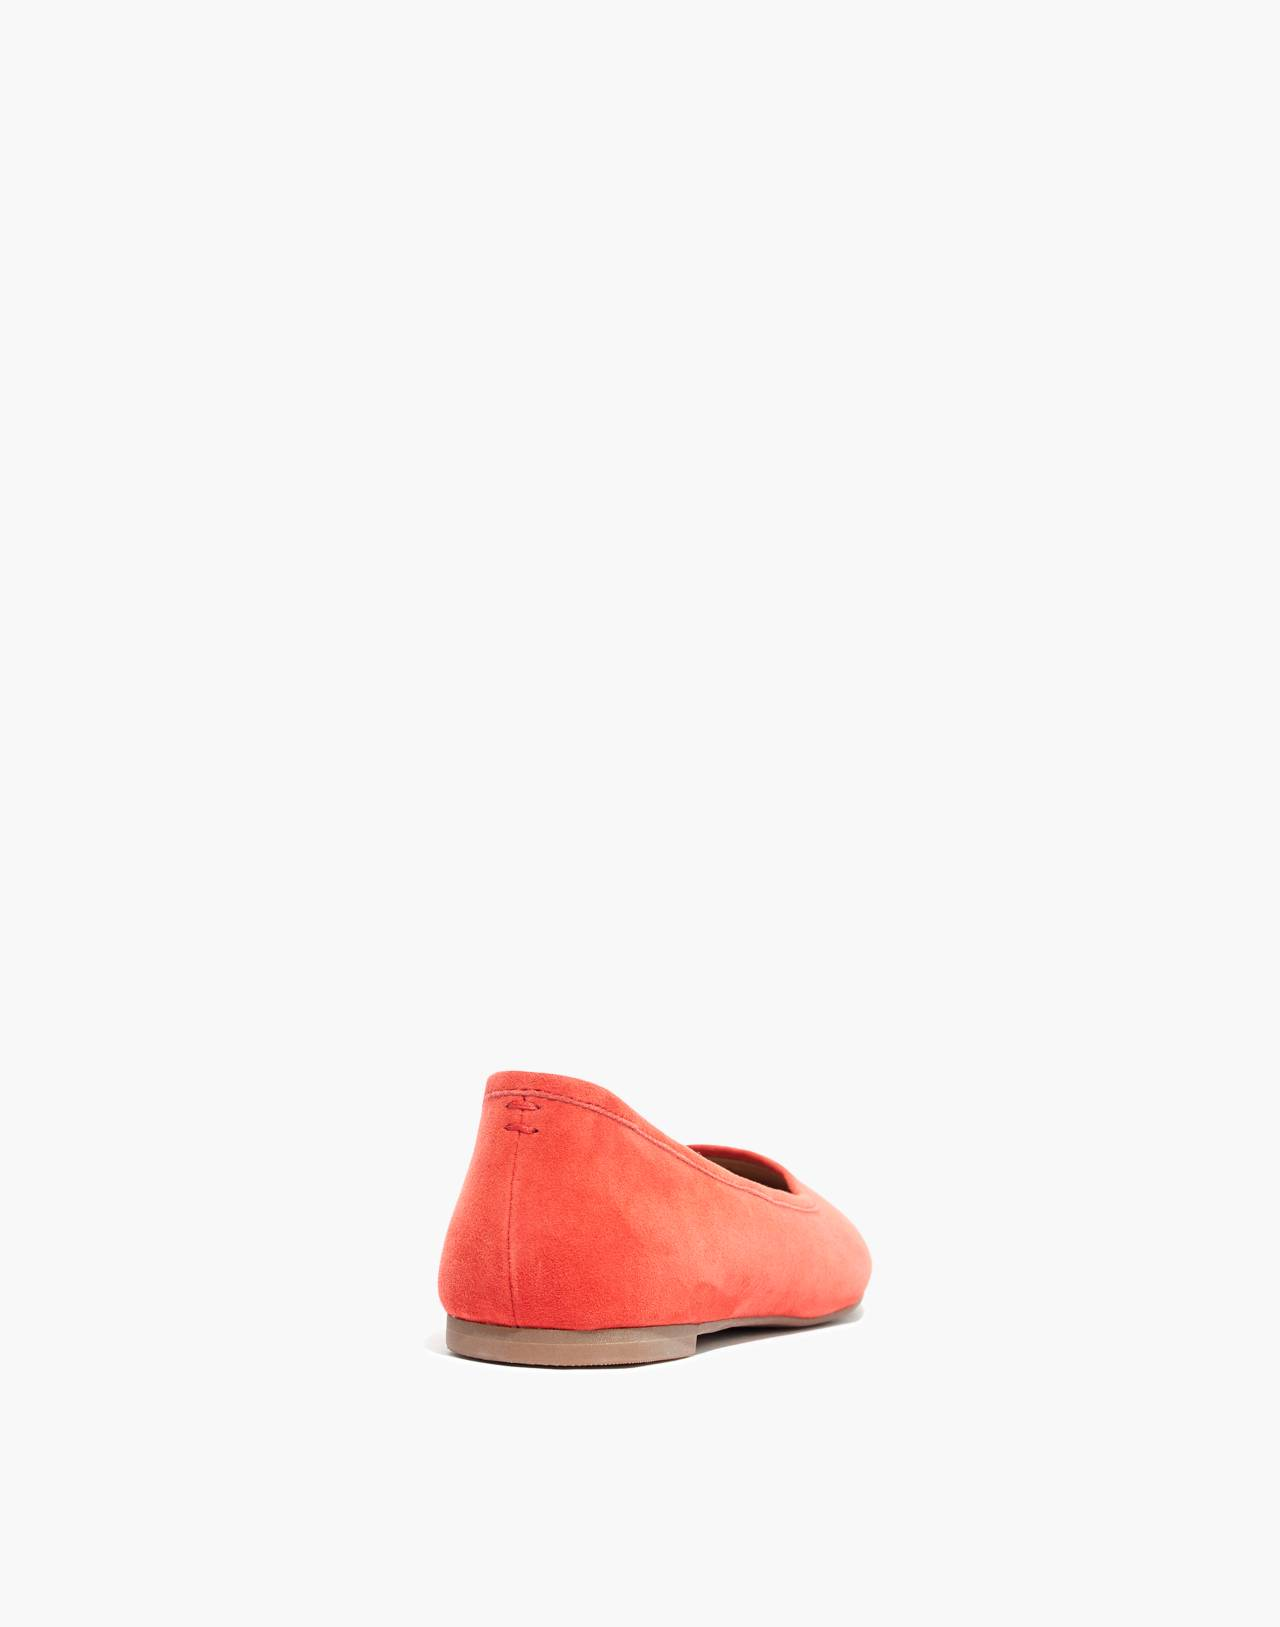 The Reid Ballet Flat in Suede in coastal orange image 3